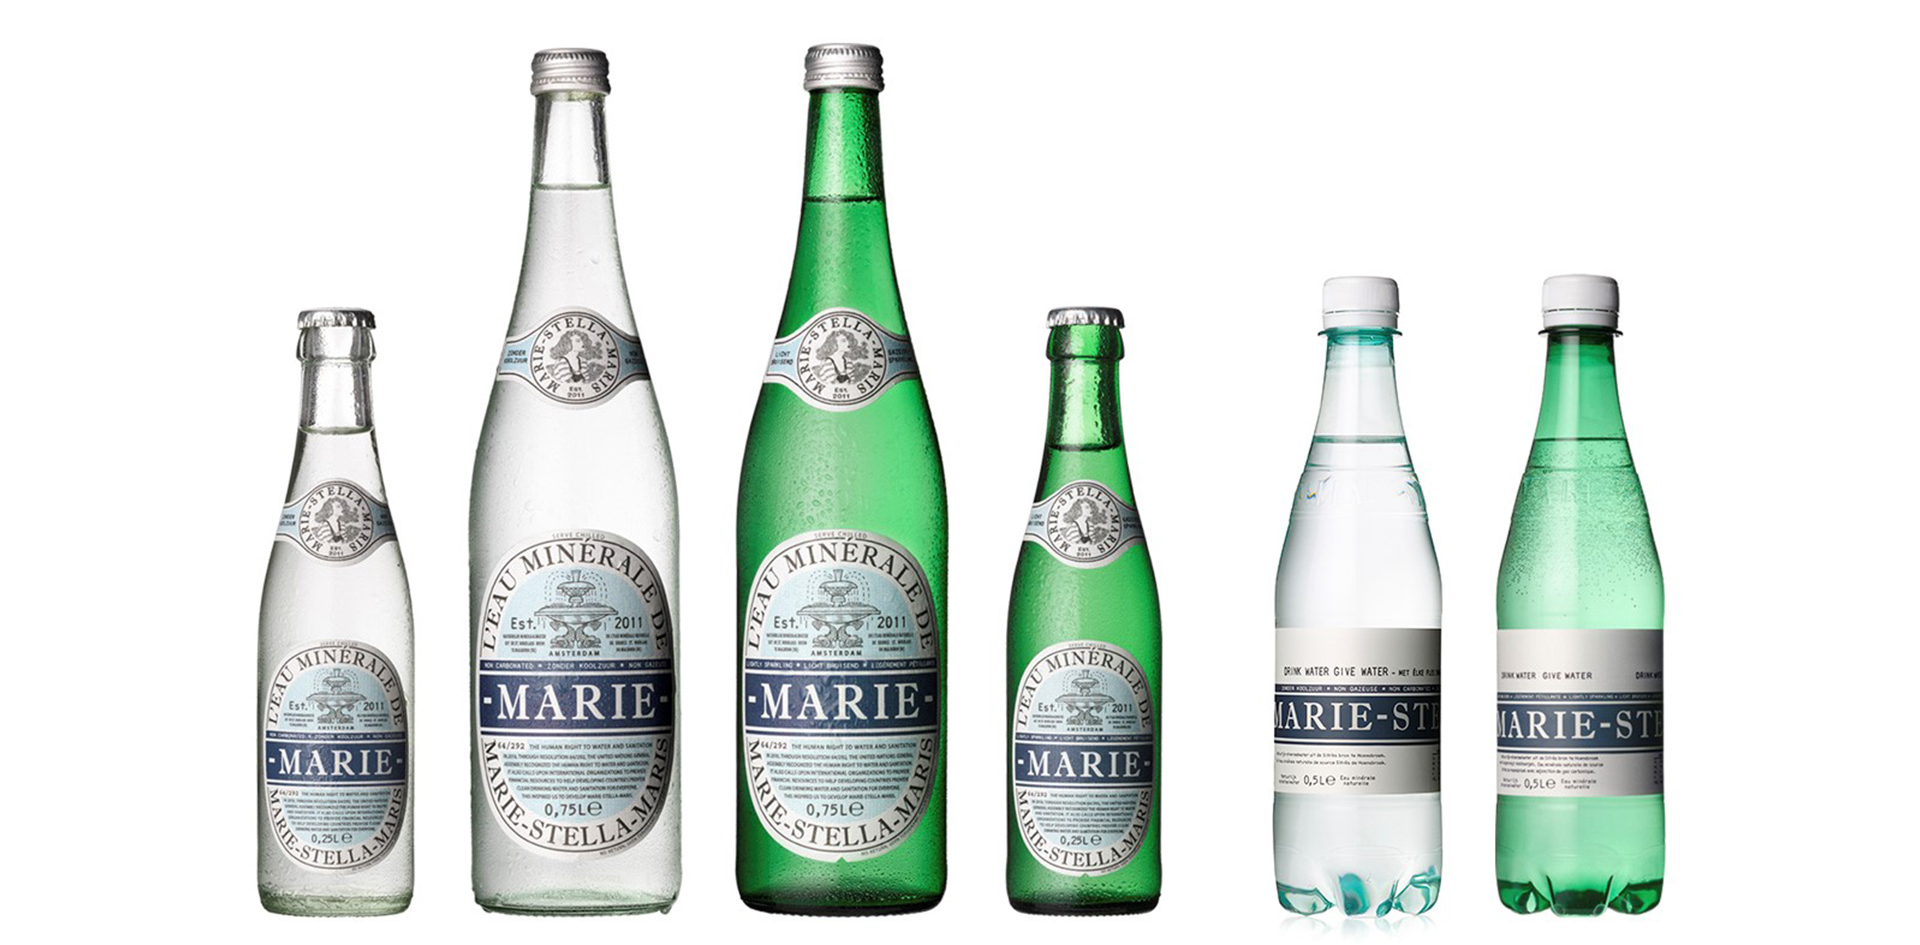 nectar-utrecht-frisdrank-water-producent-nederland-streekproduct-amsterdam-marie-stella-maris-assortiment